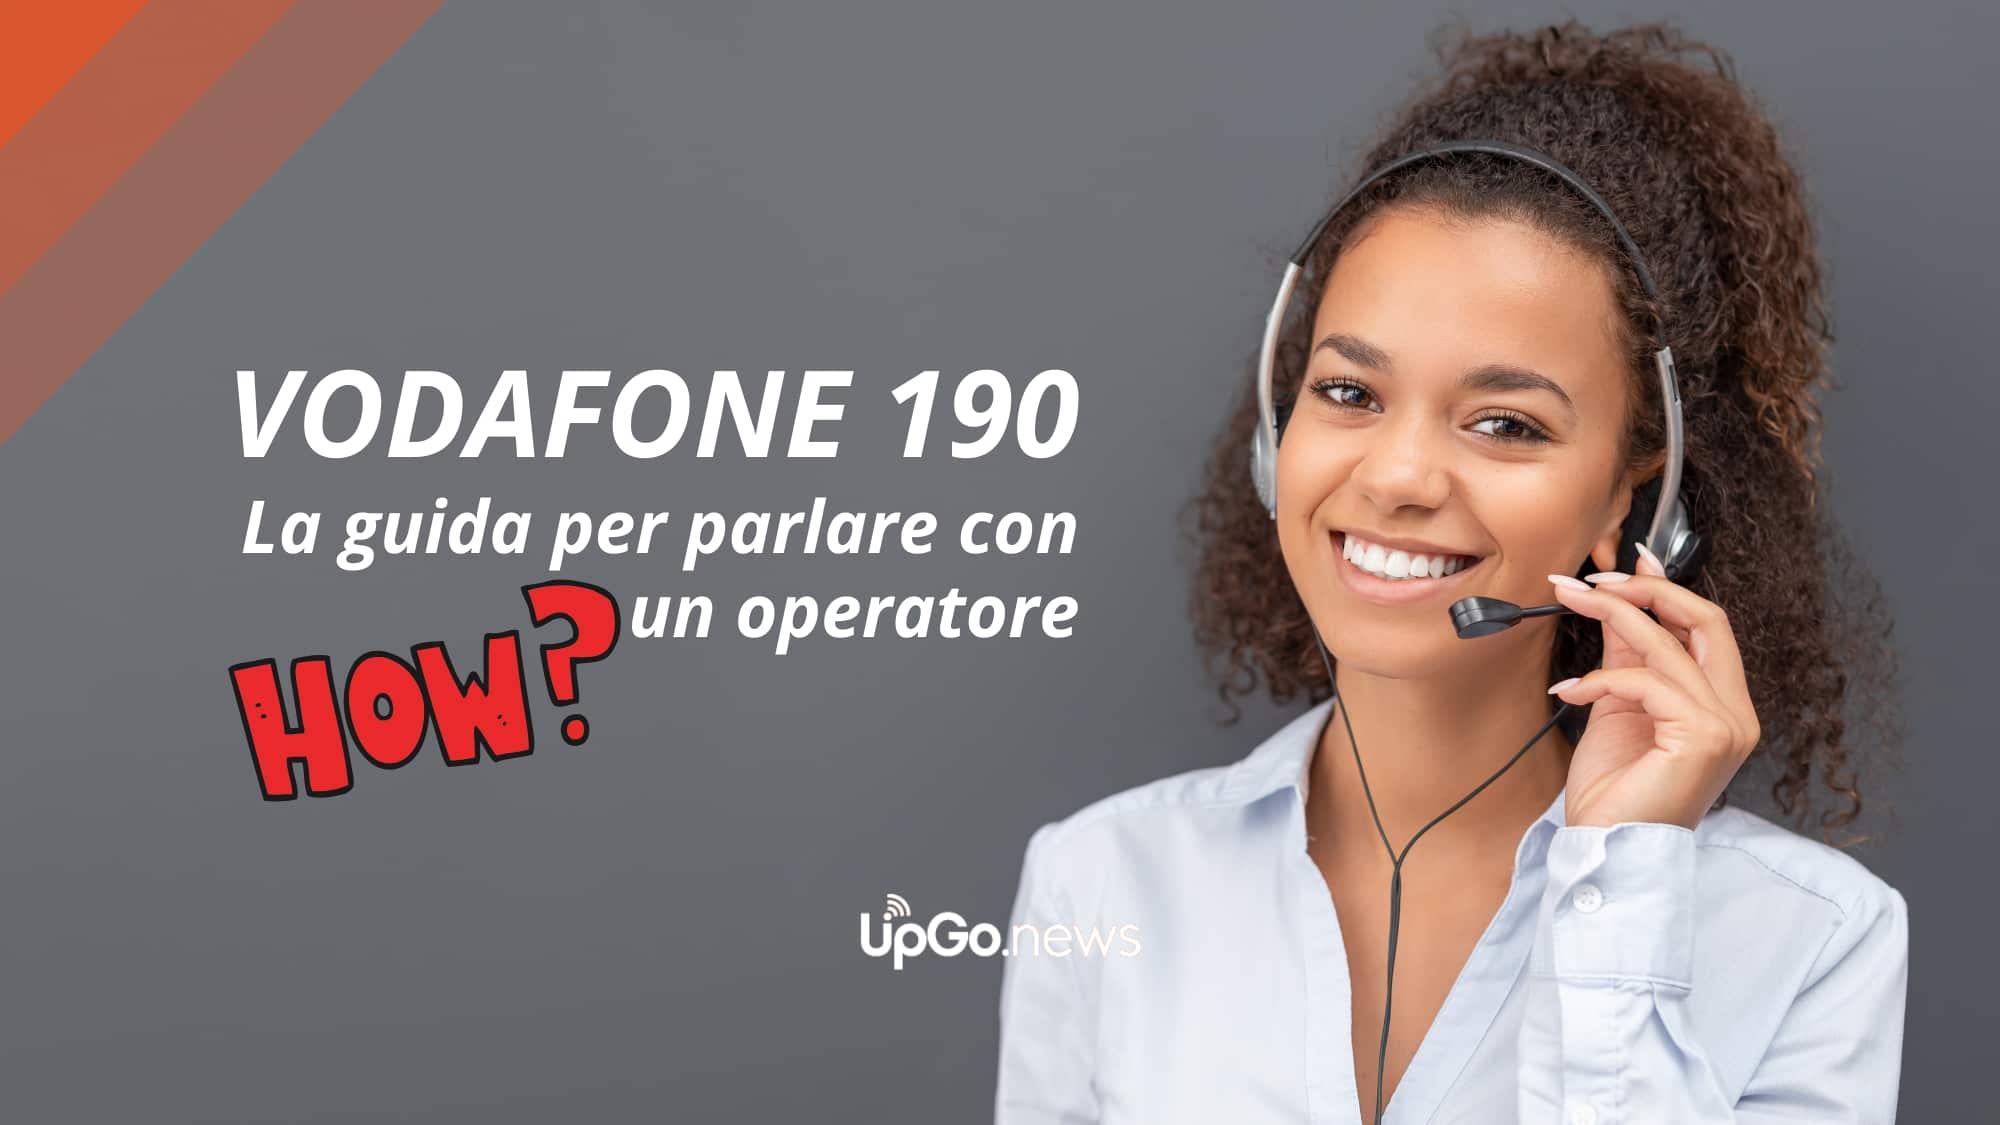 Vodafone 190